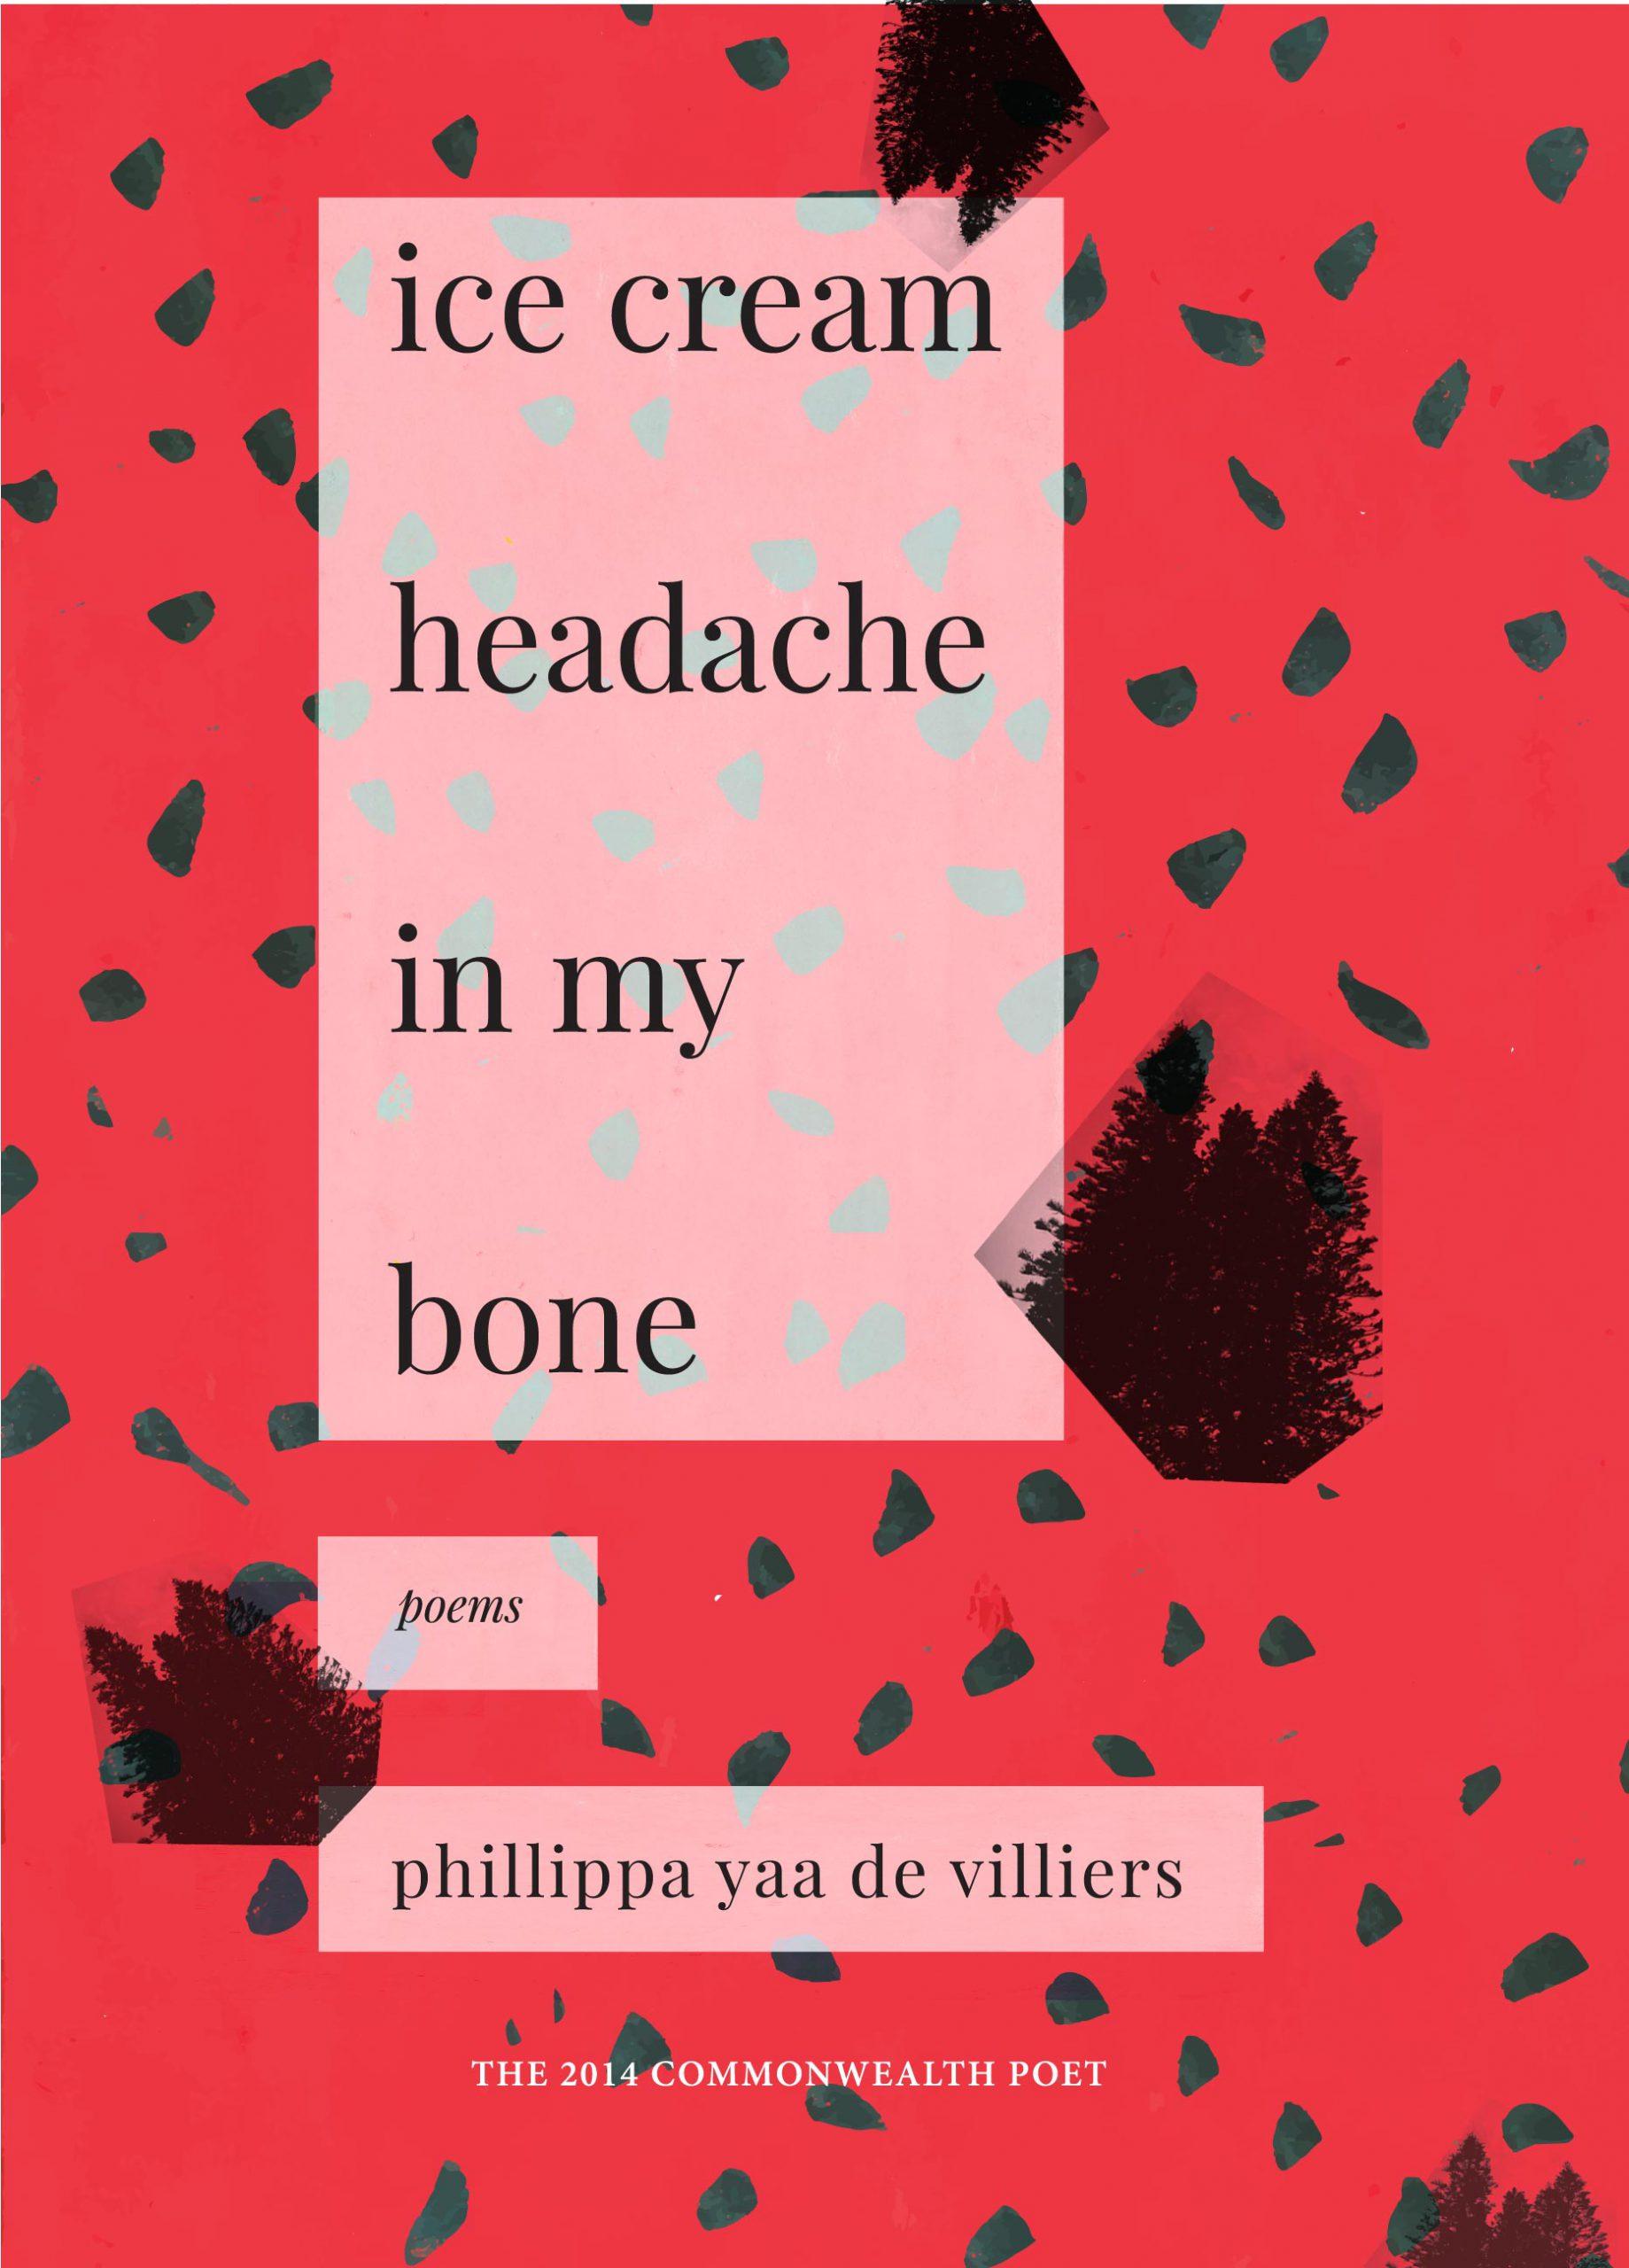 ice cream headache in my bone - Phillippa Yaa de Villiers